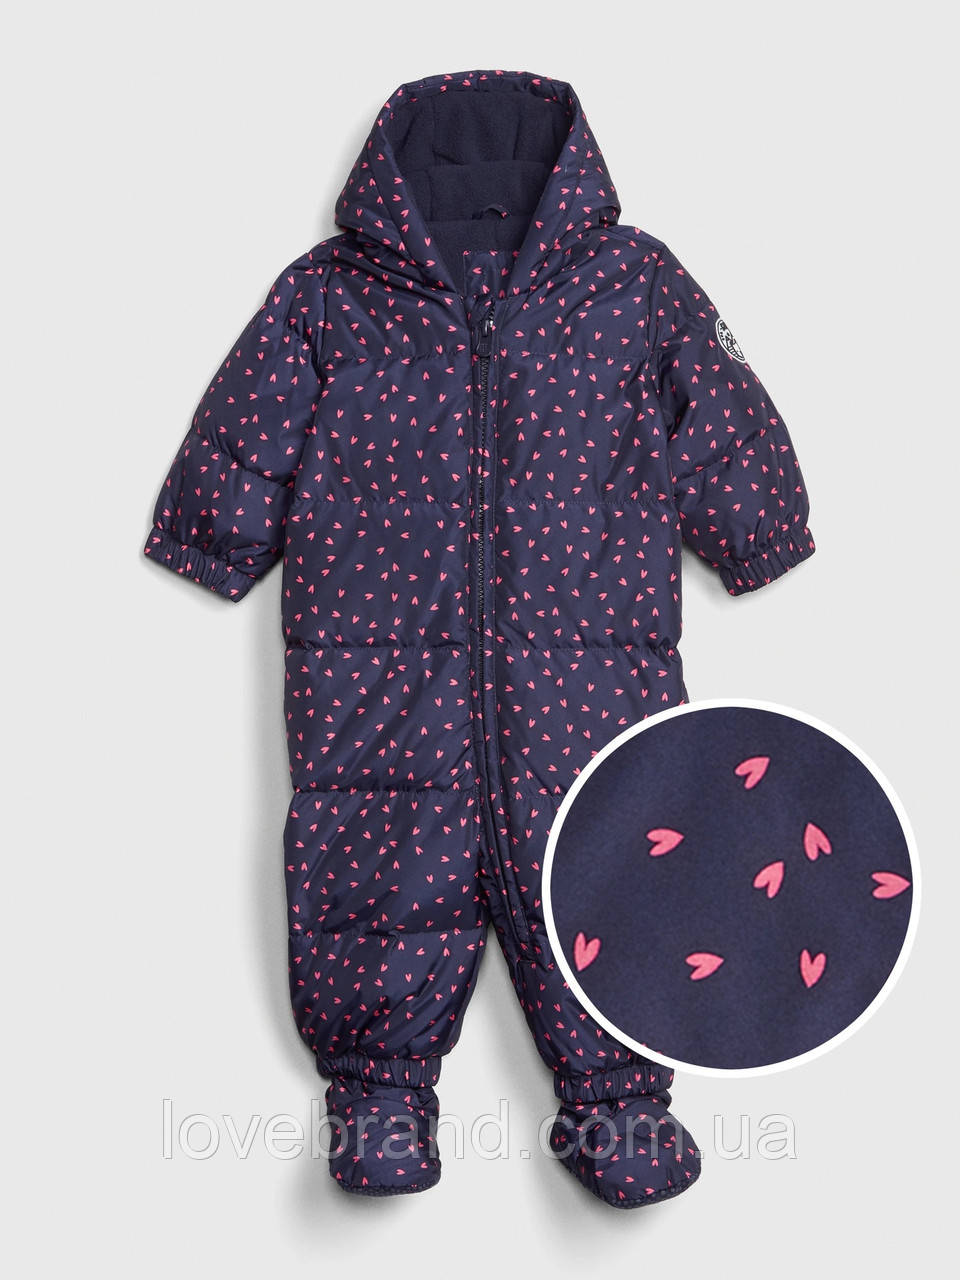 Пуховый комбинезон GAP для девочки синий в сердечки на зиму